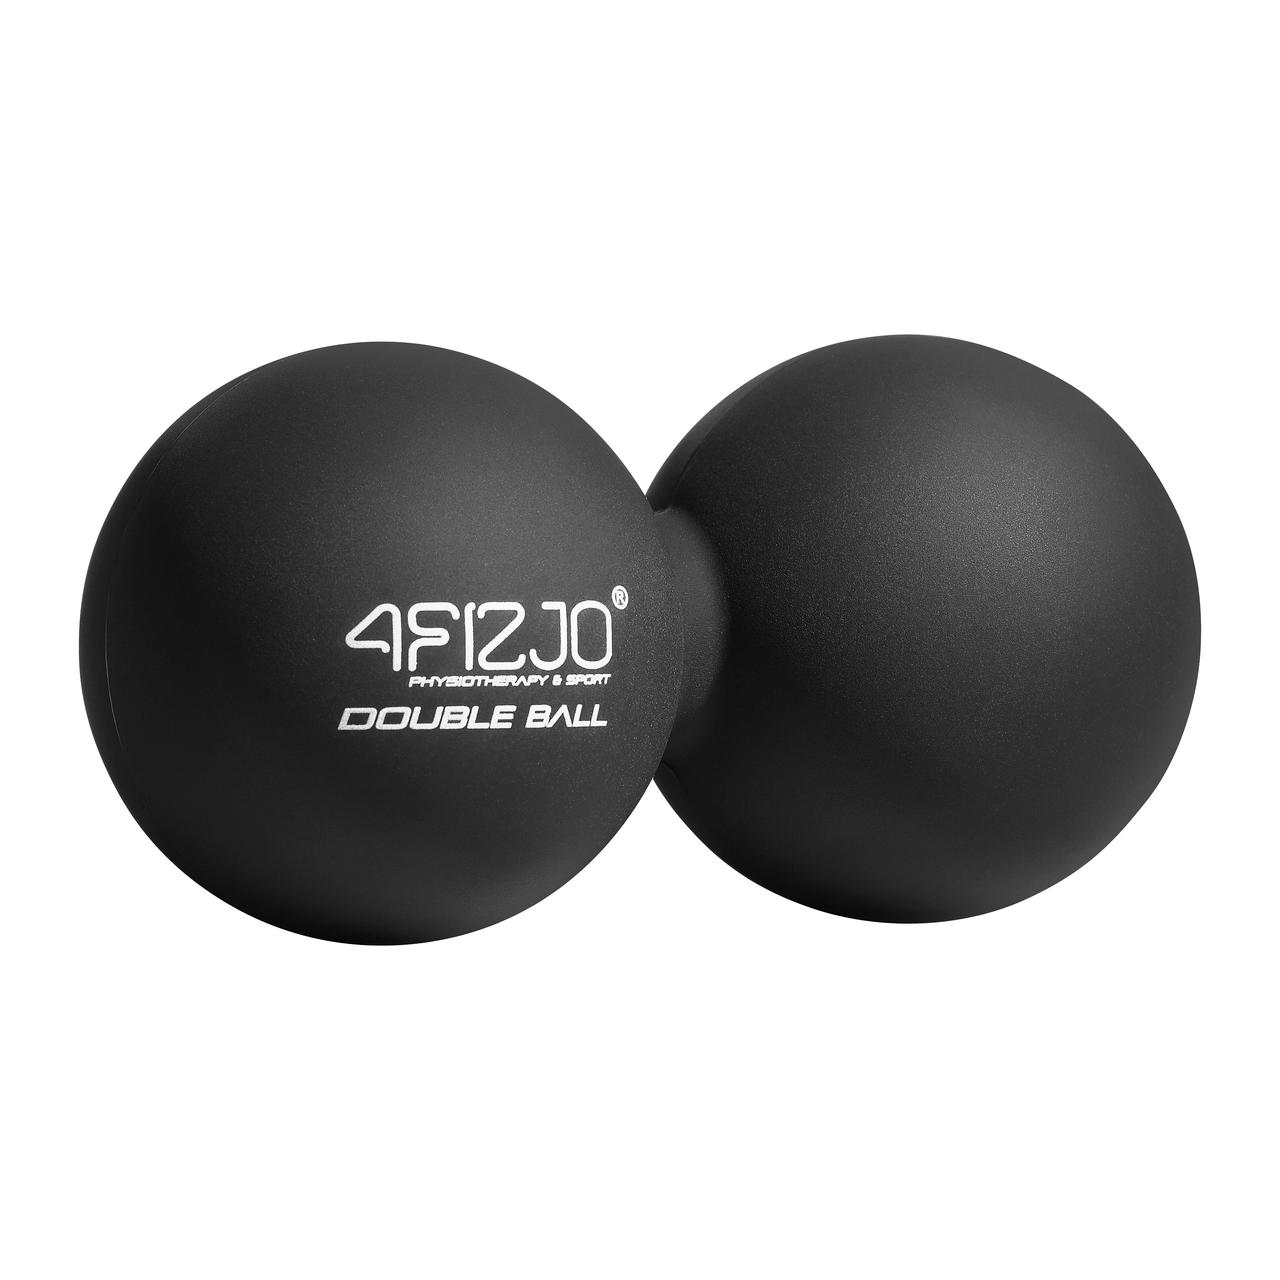 Массажный мяч двойной 4FIZJO Lacrosse Double Ball 6.5 x 13.5 см 4FJ1226 Black